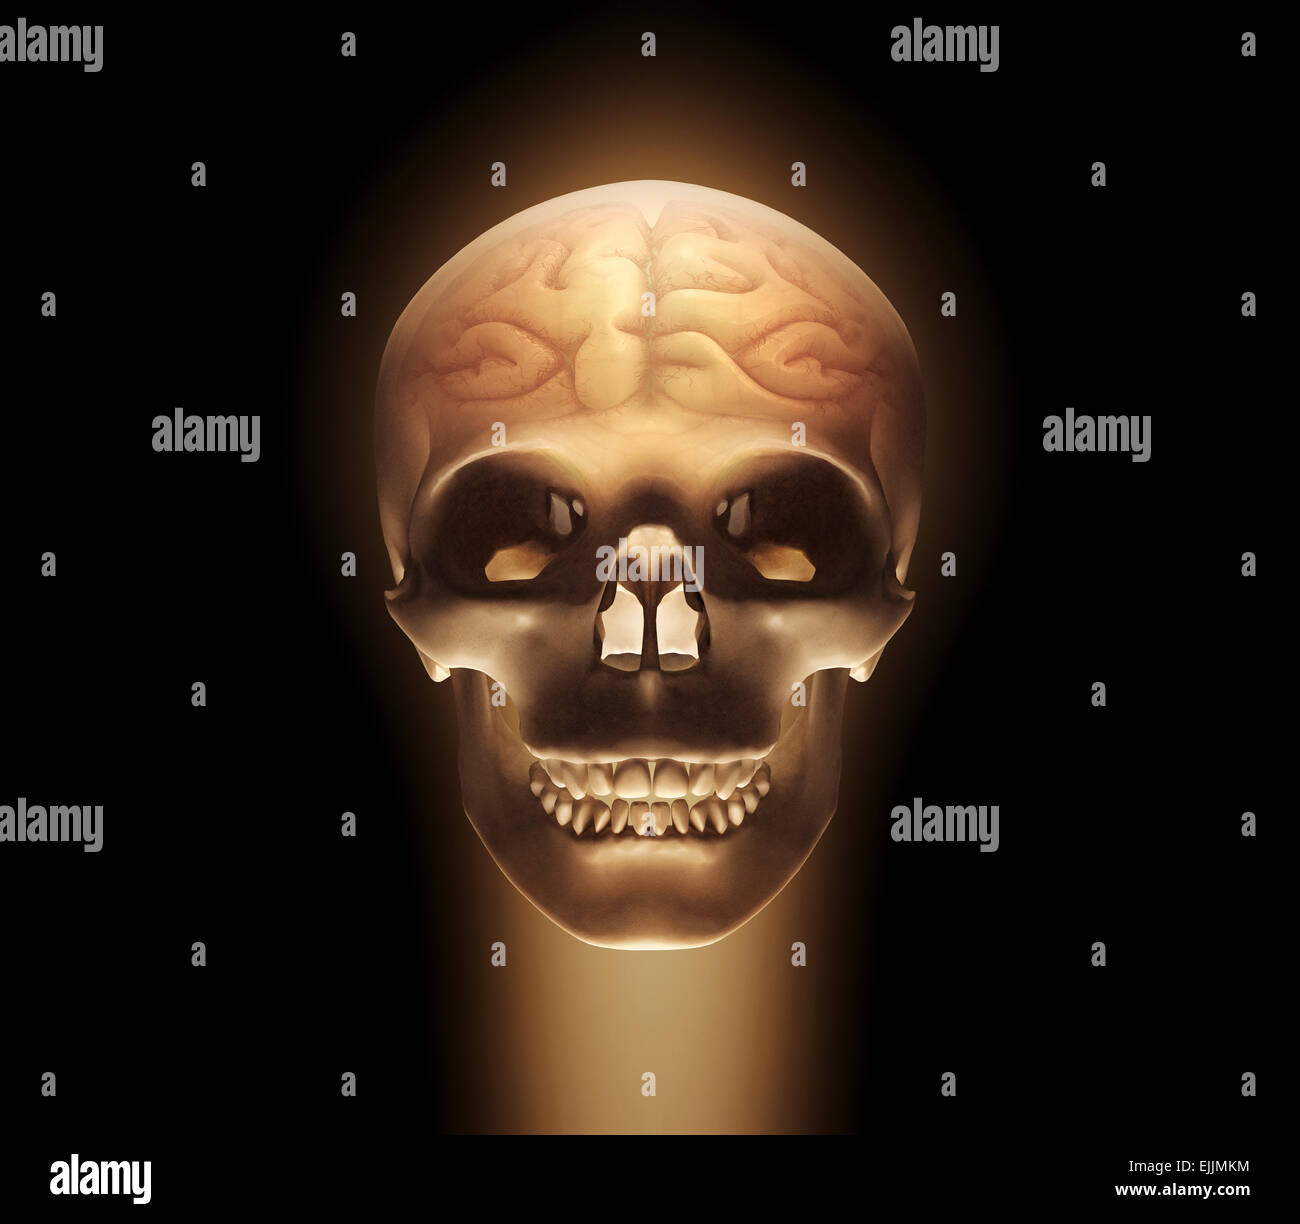 Human skull and brain, computer illustration. - Stock Image